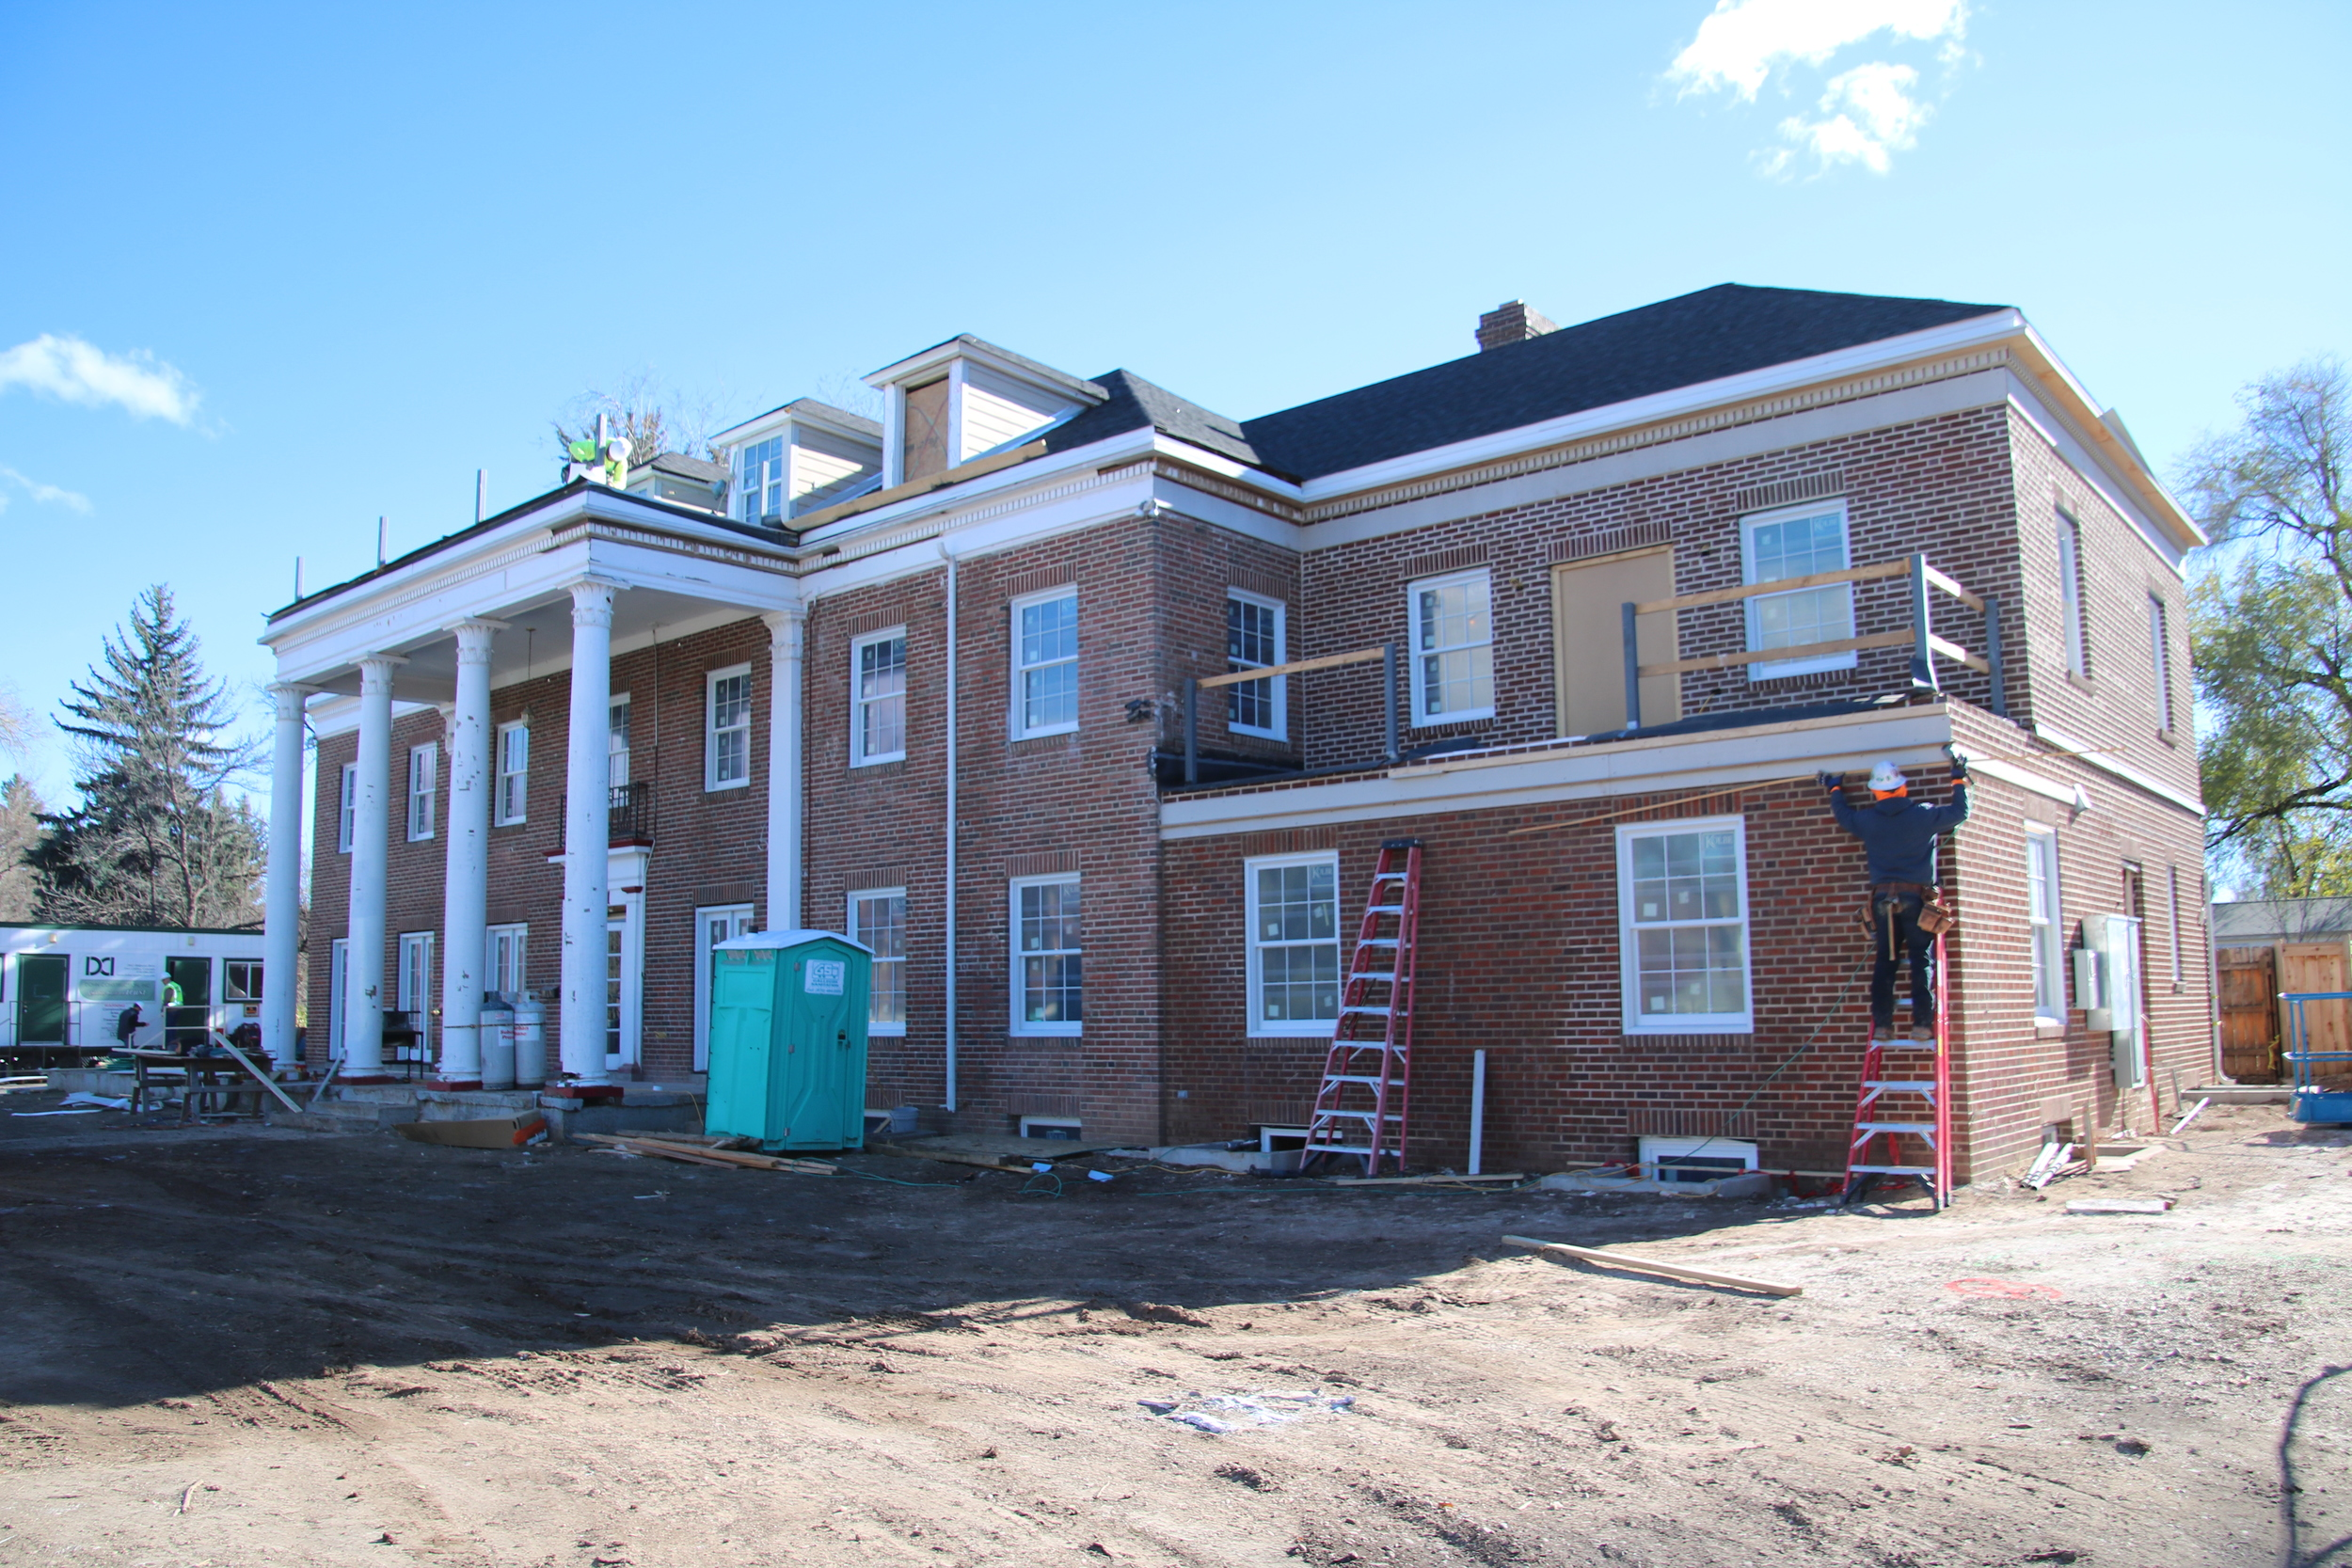 2015-11-18 new windows trim front of house.JPG